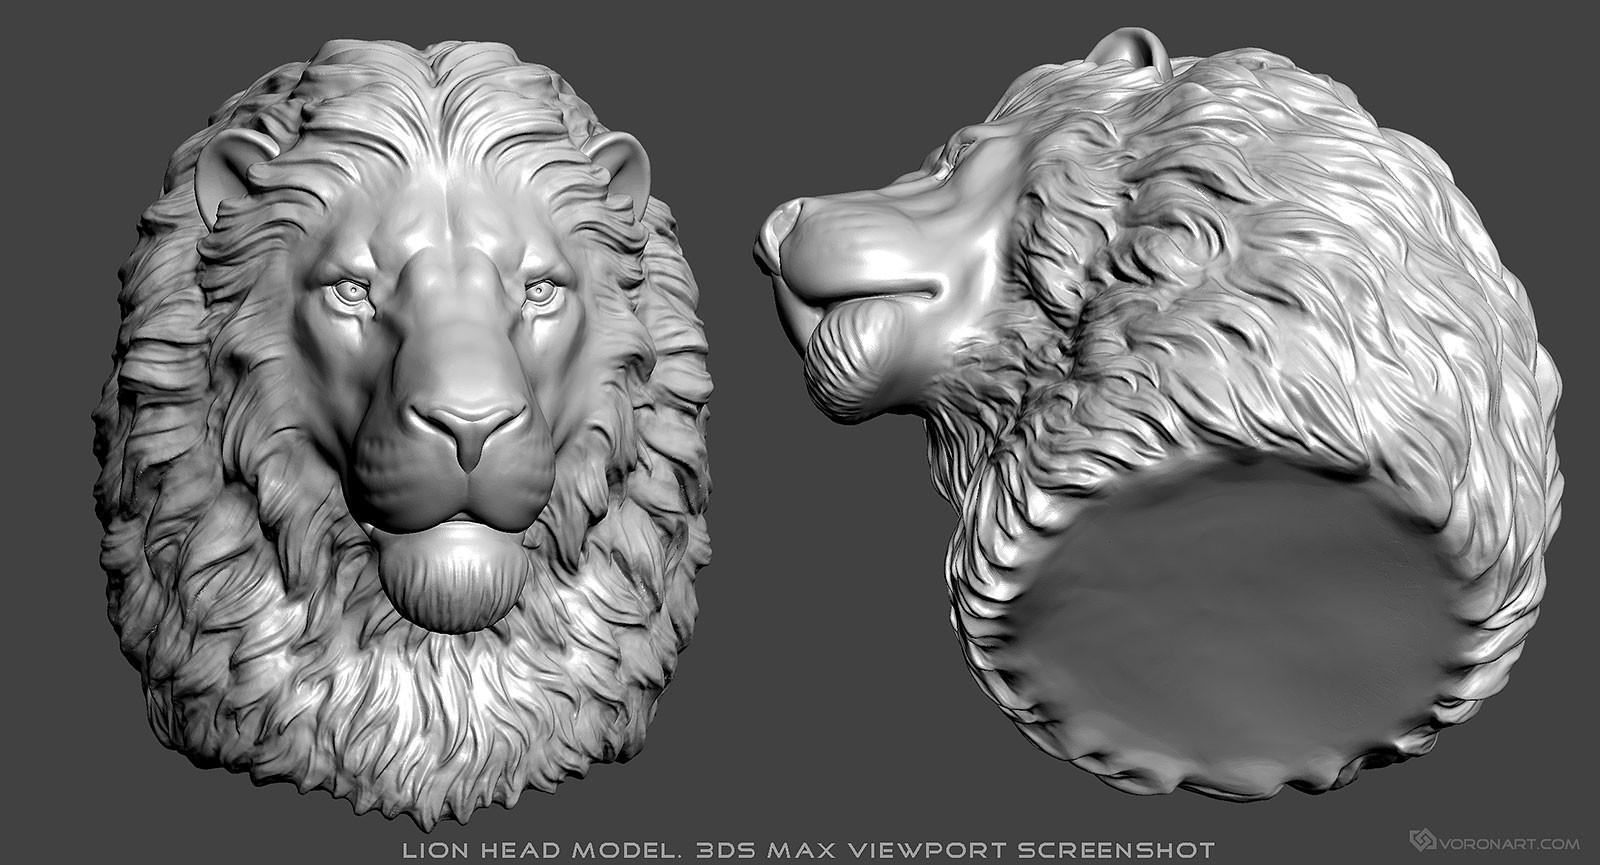 nikolay vorobyov lion head 3d model digital sculpture